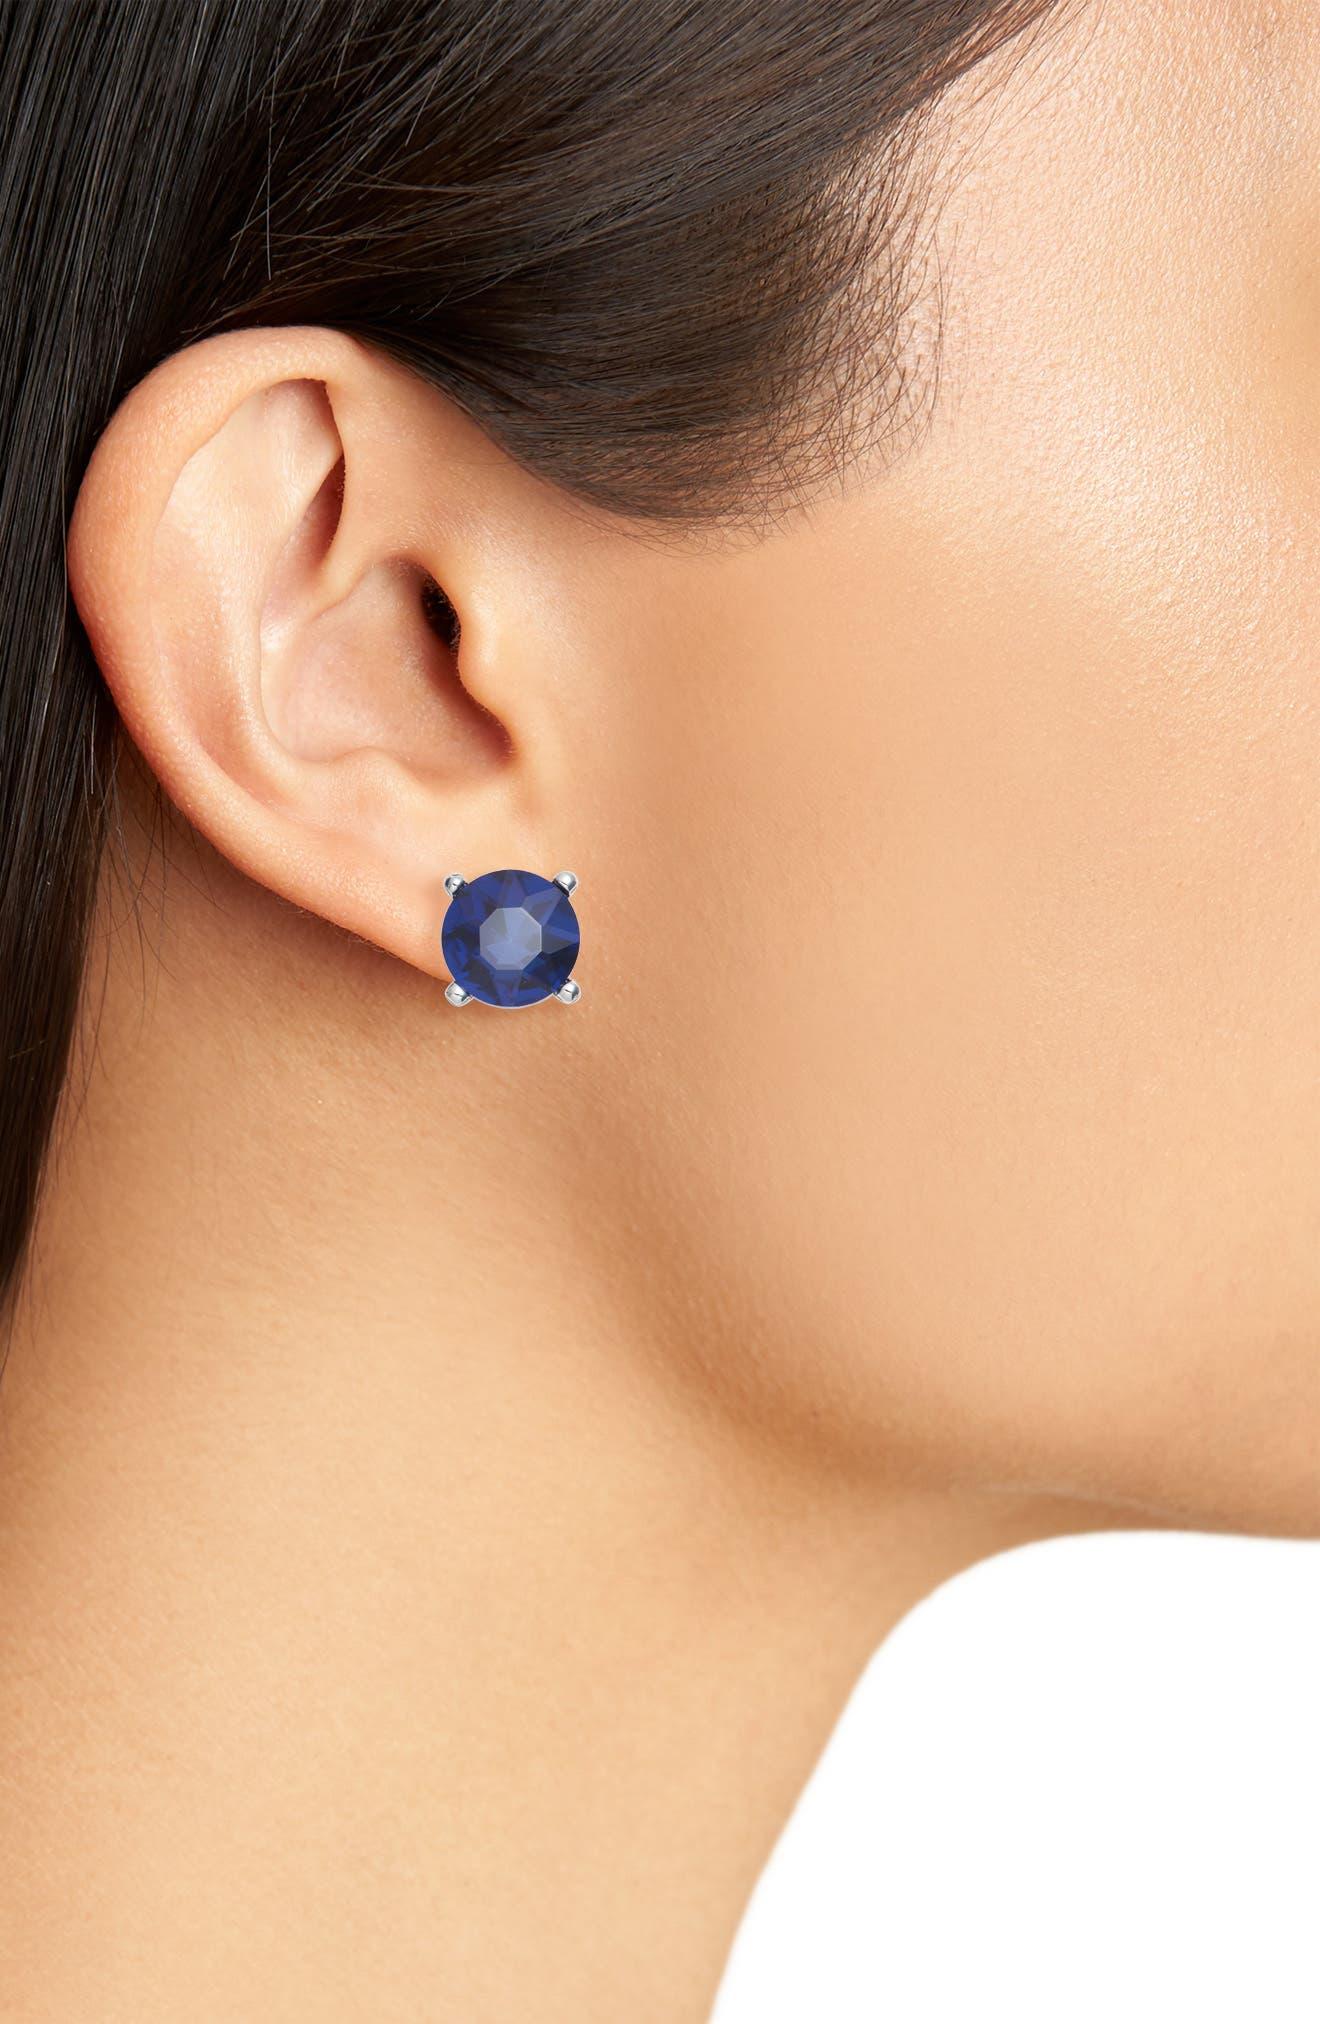 Jewel Stud Earrings,                             Alternate thumbnail 2, color,                             040